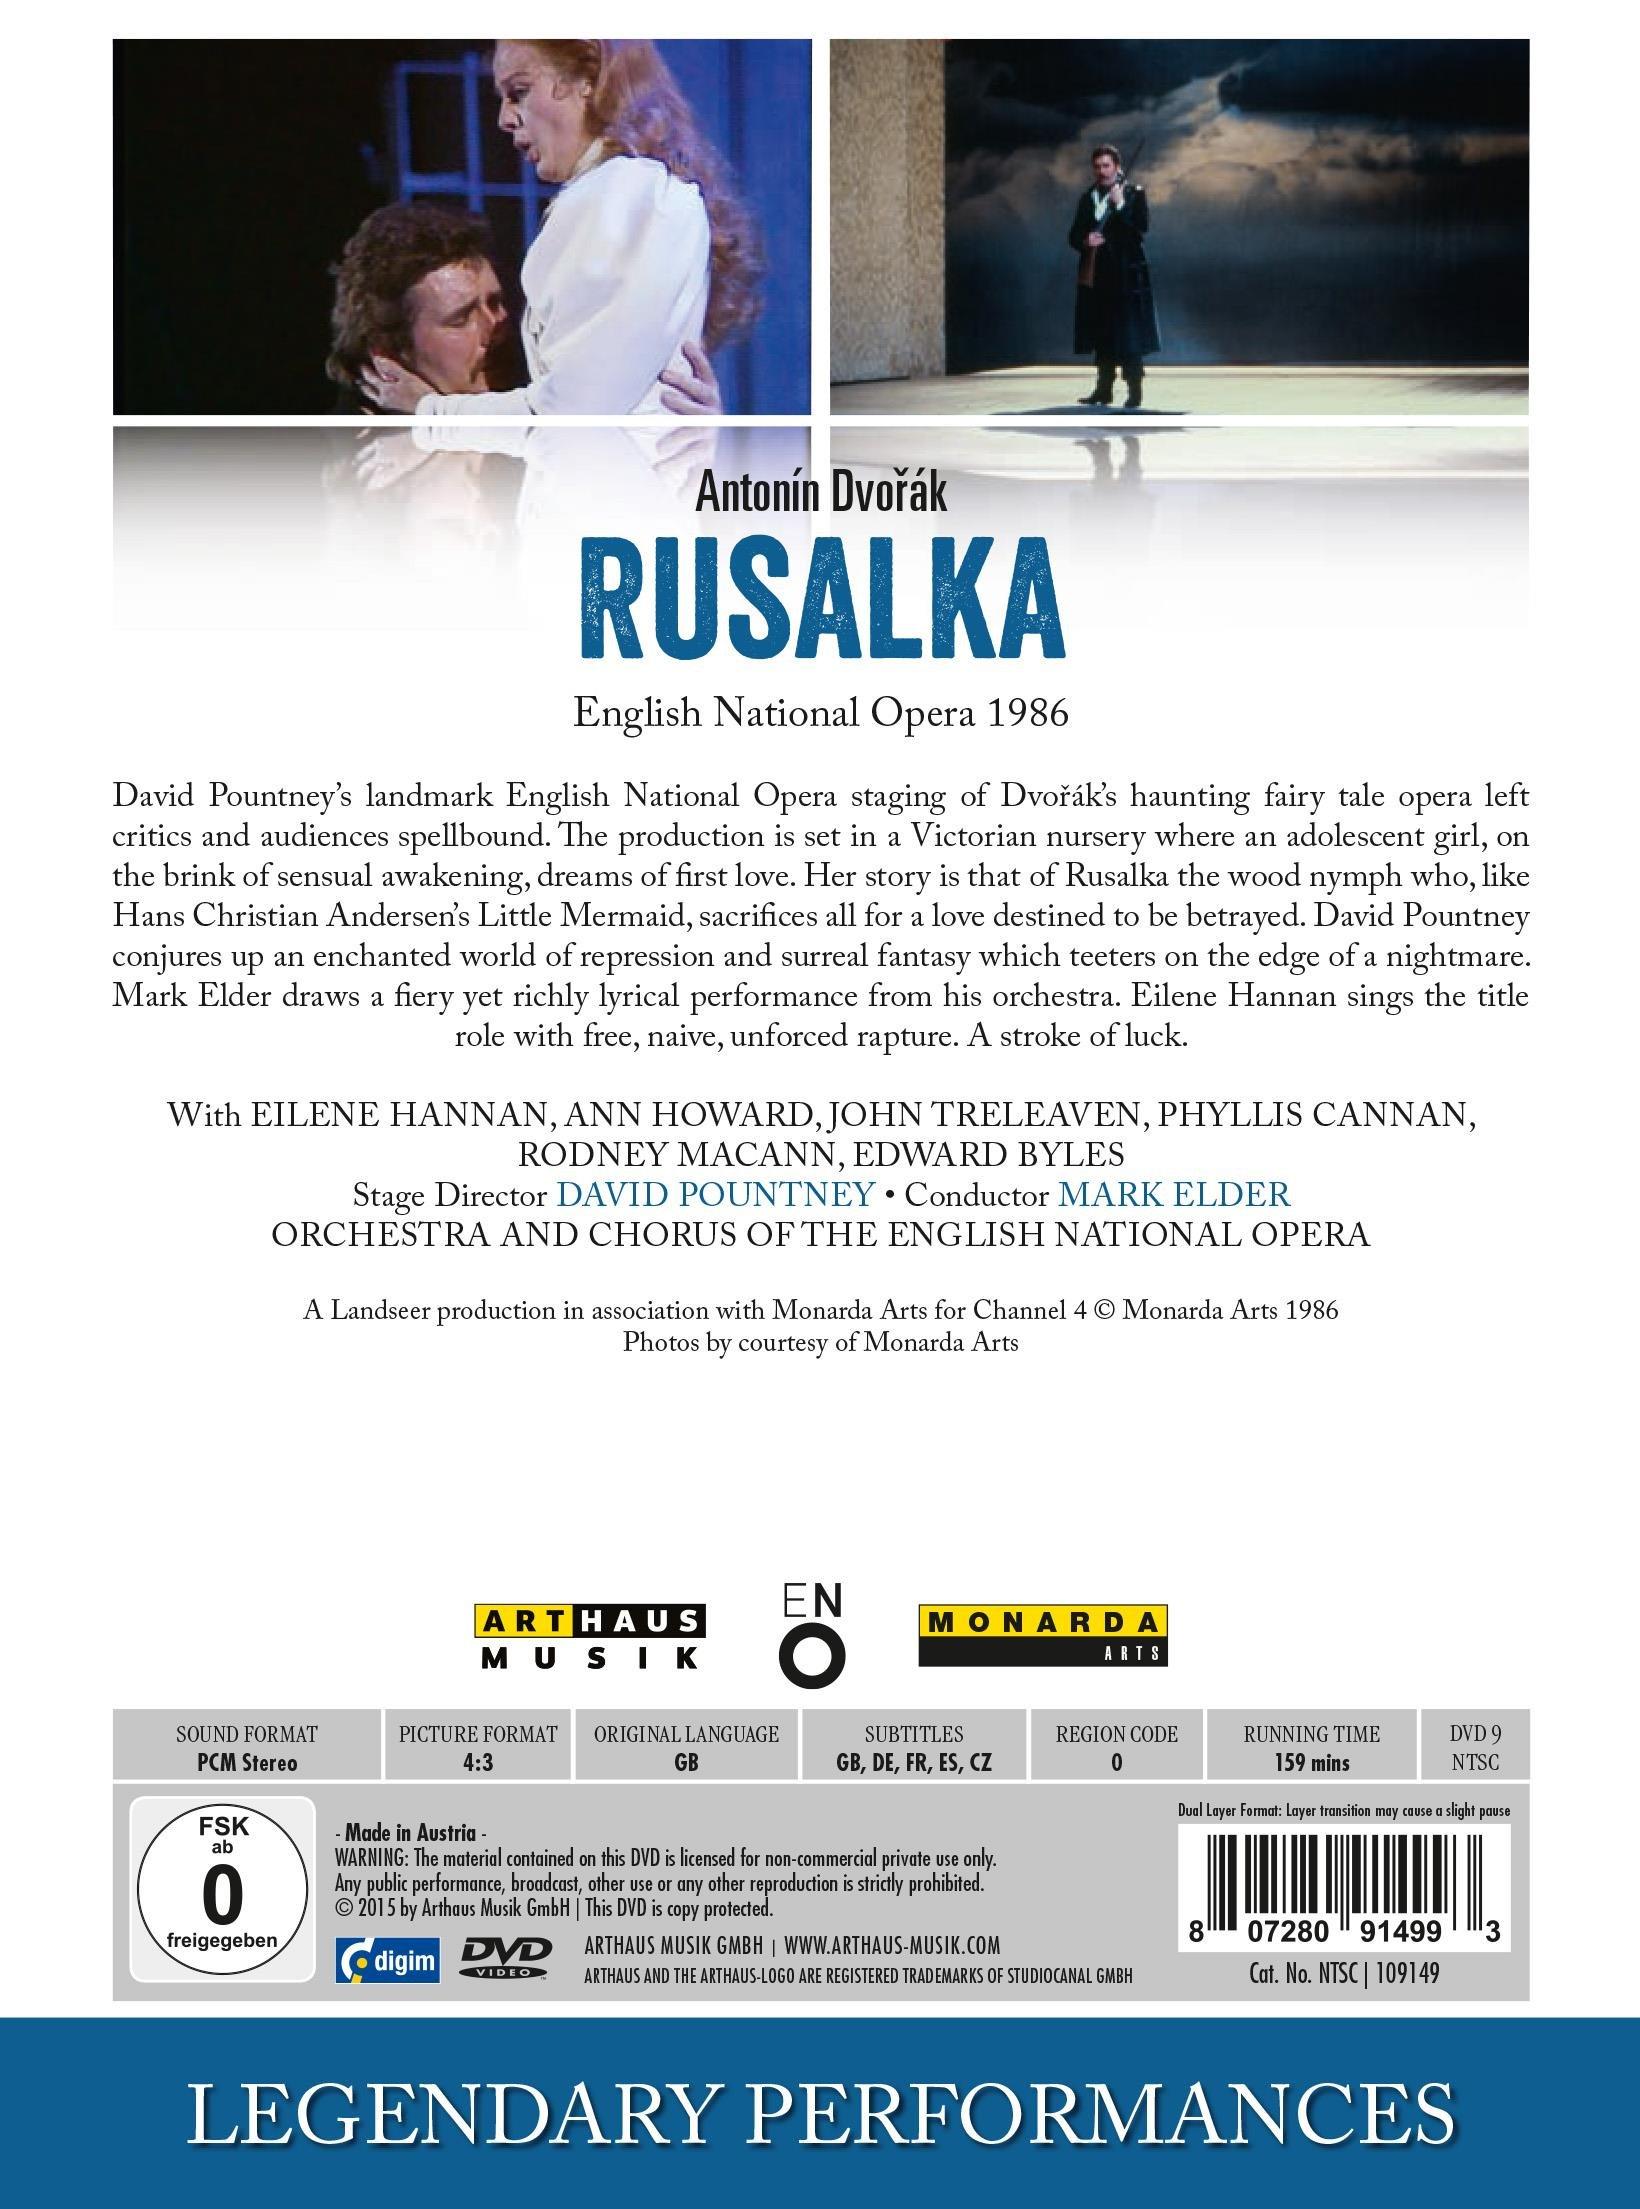 Antonin Dvorák: Rusalka (Legendary Performances) by Arthaus